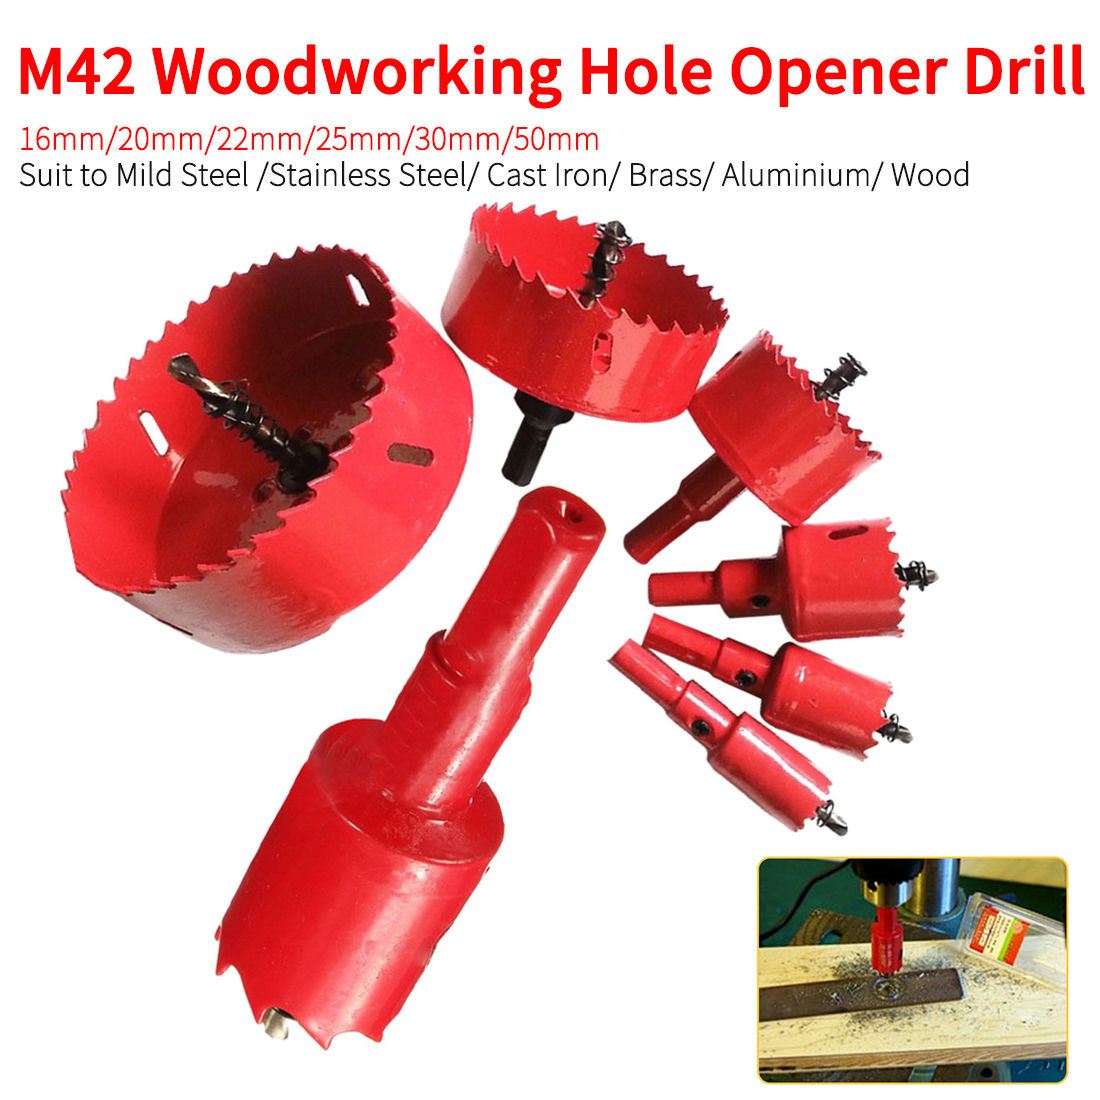 Woodworking Wood Tool Bit M42 Hole Saws Opener Drill Bit For DIY Wood Metal Cutter Drill 16mm/20mm/22mm/25mm/30mm/50mm